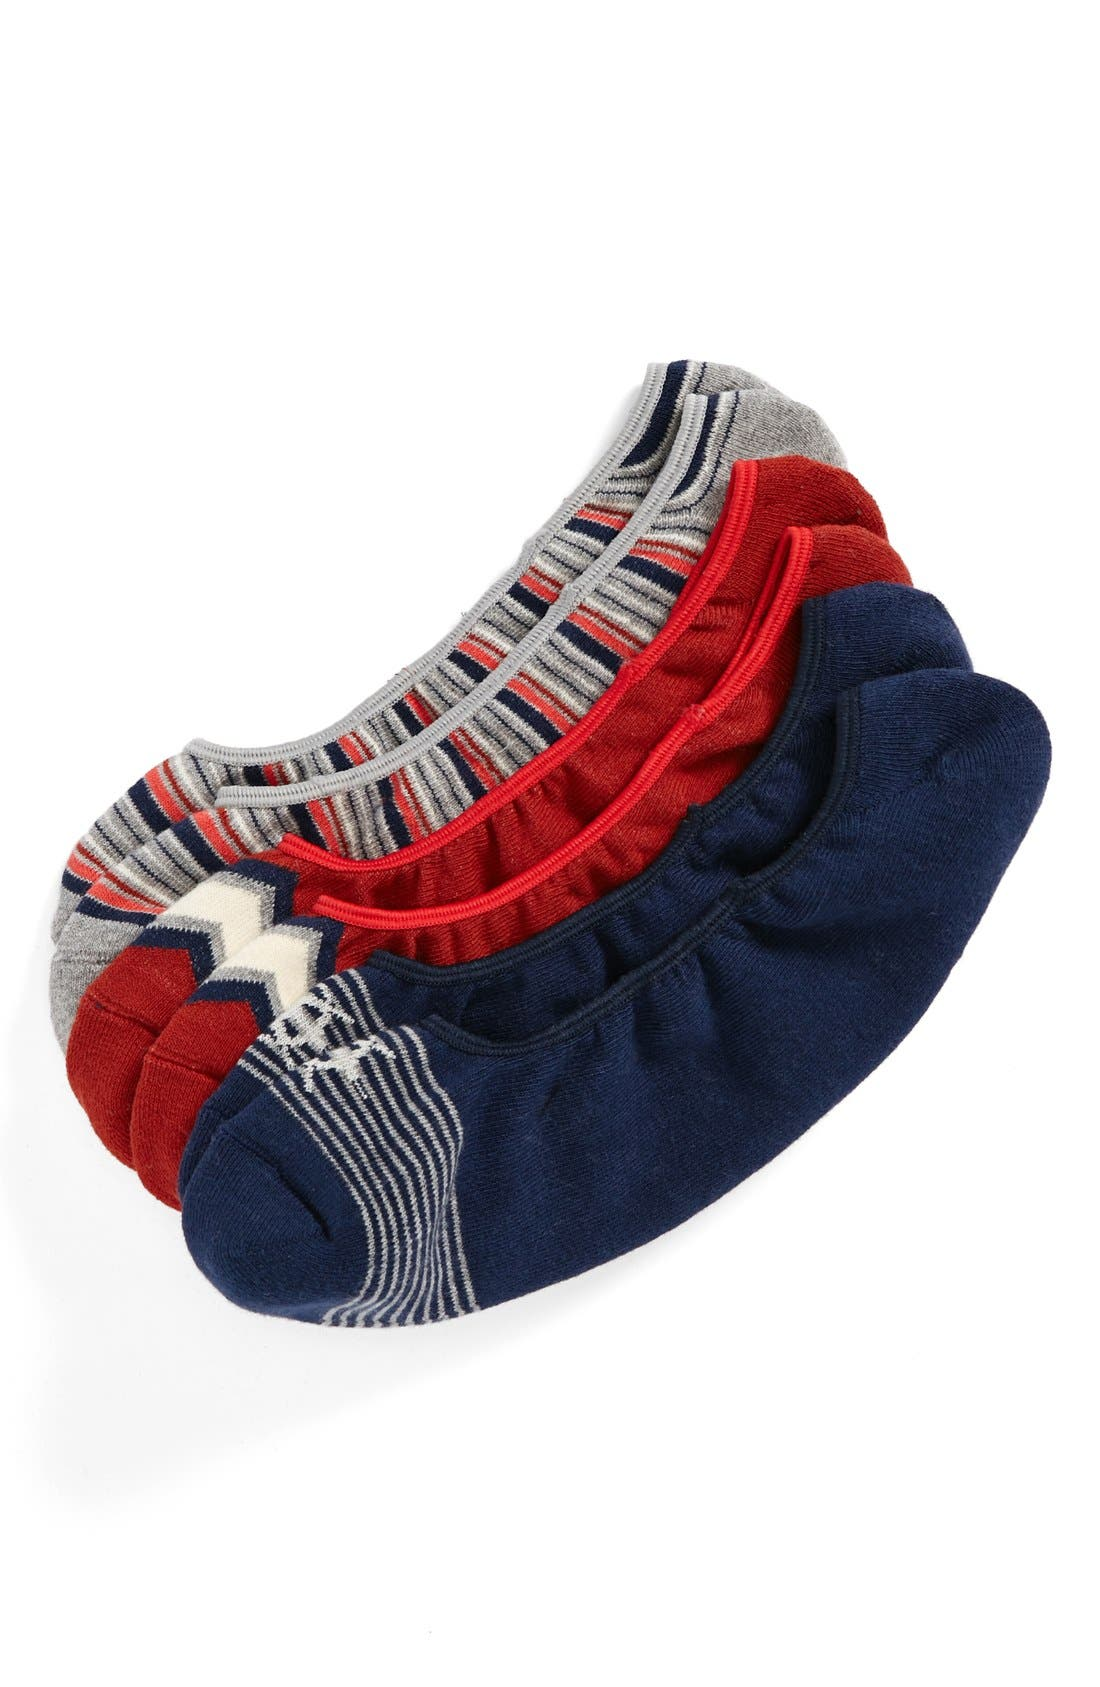 Main Image - PACT 'Picnic' Organic Cotton No-Show Socks (3-Pack)